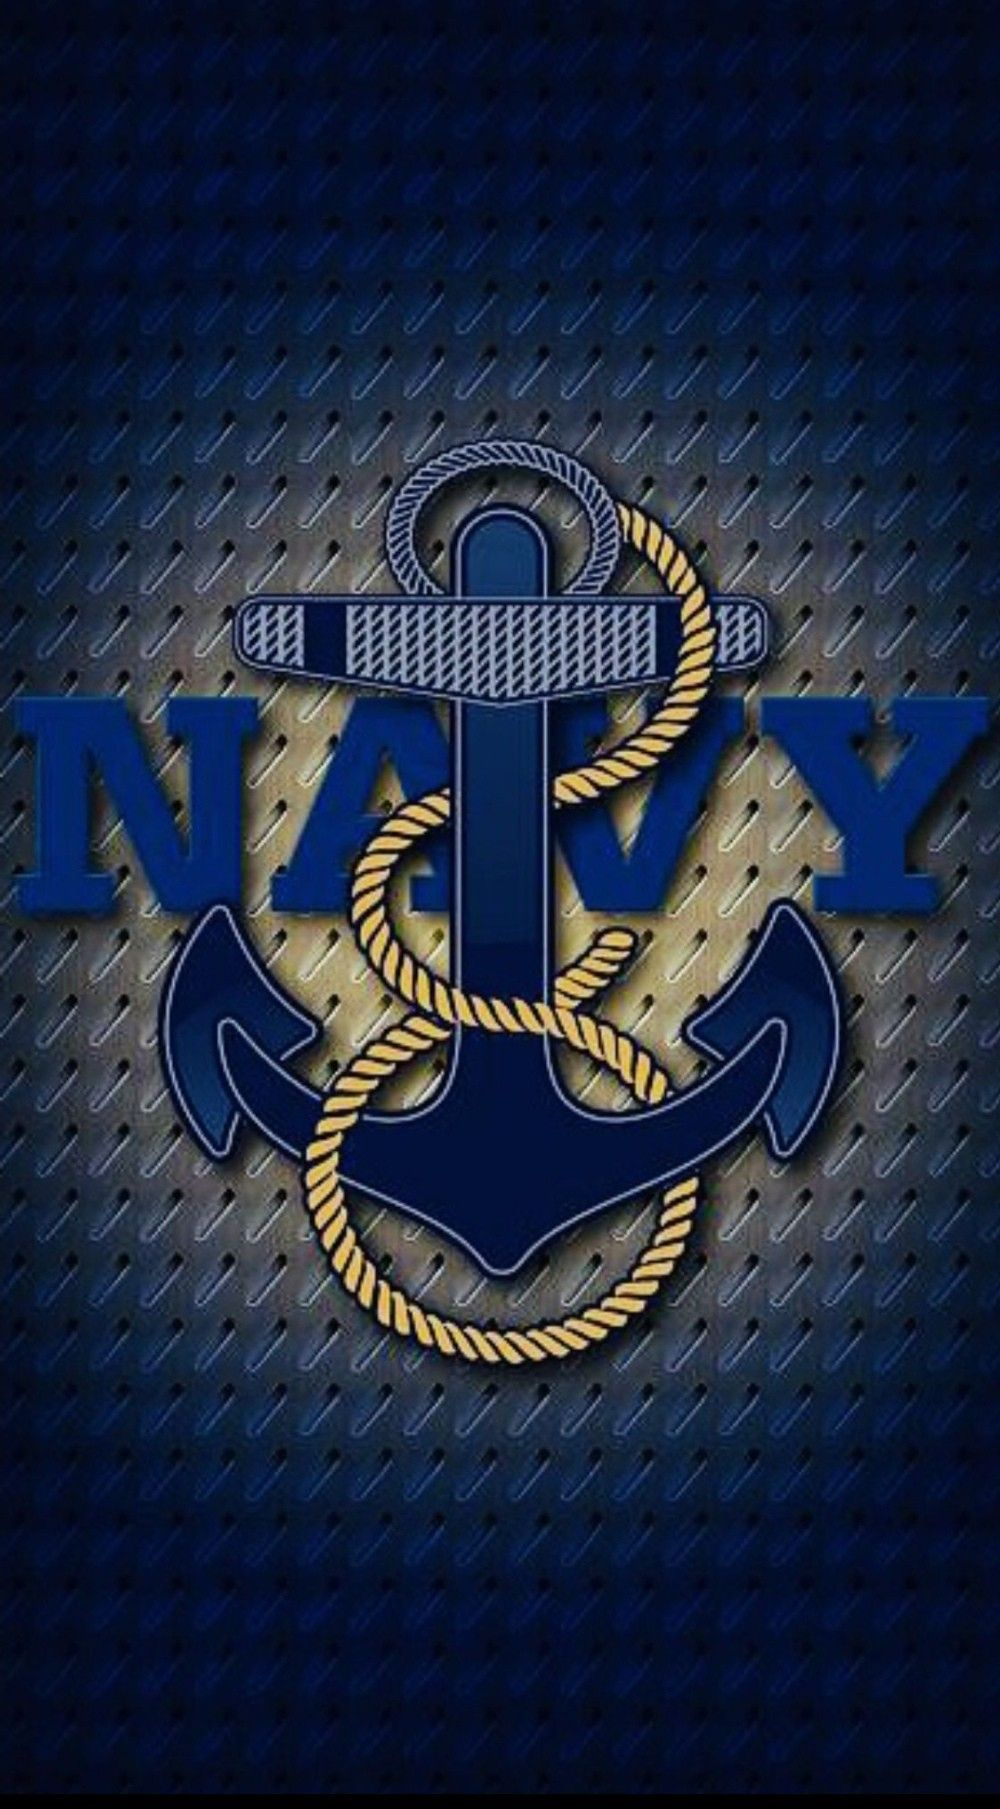 Pin By Jaimedoria On Anime Us Navy Wallpaper Navy Wallpaper Navy Tattoos